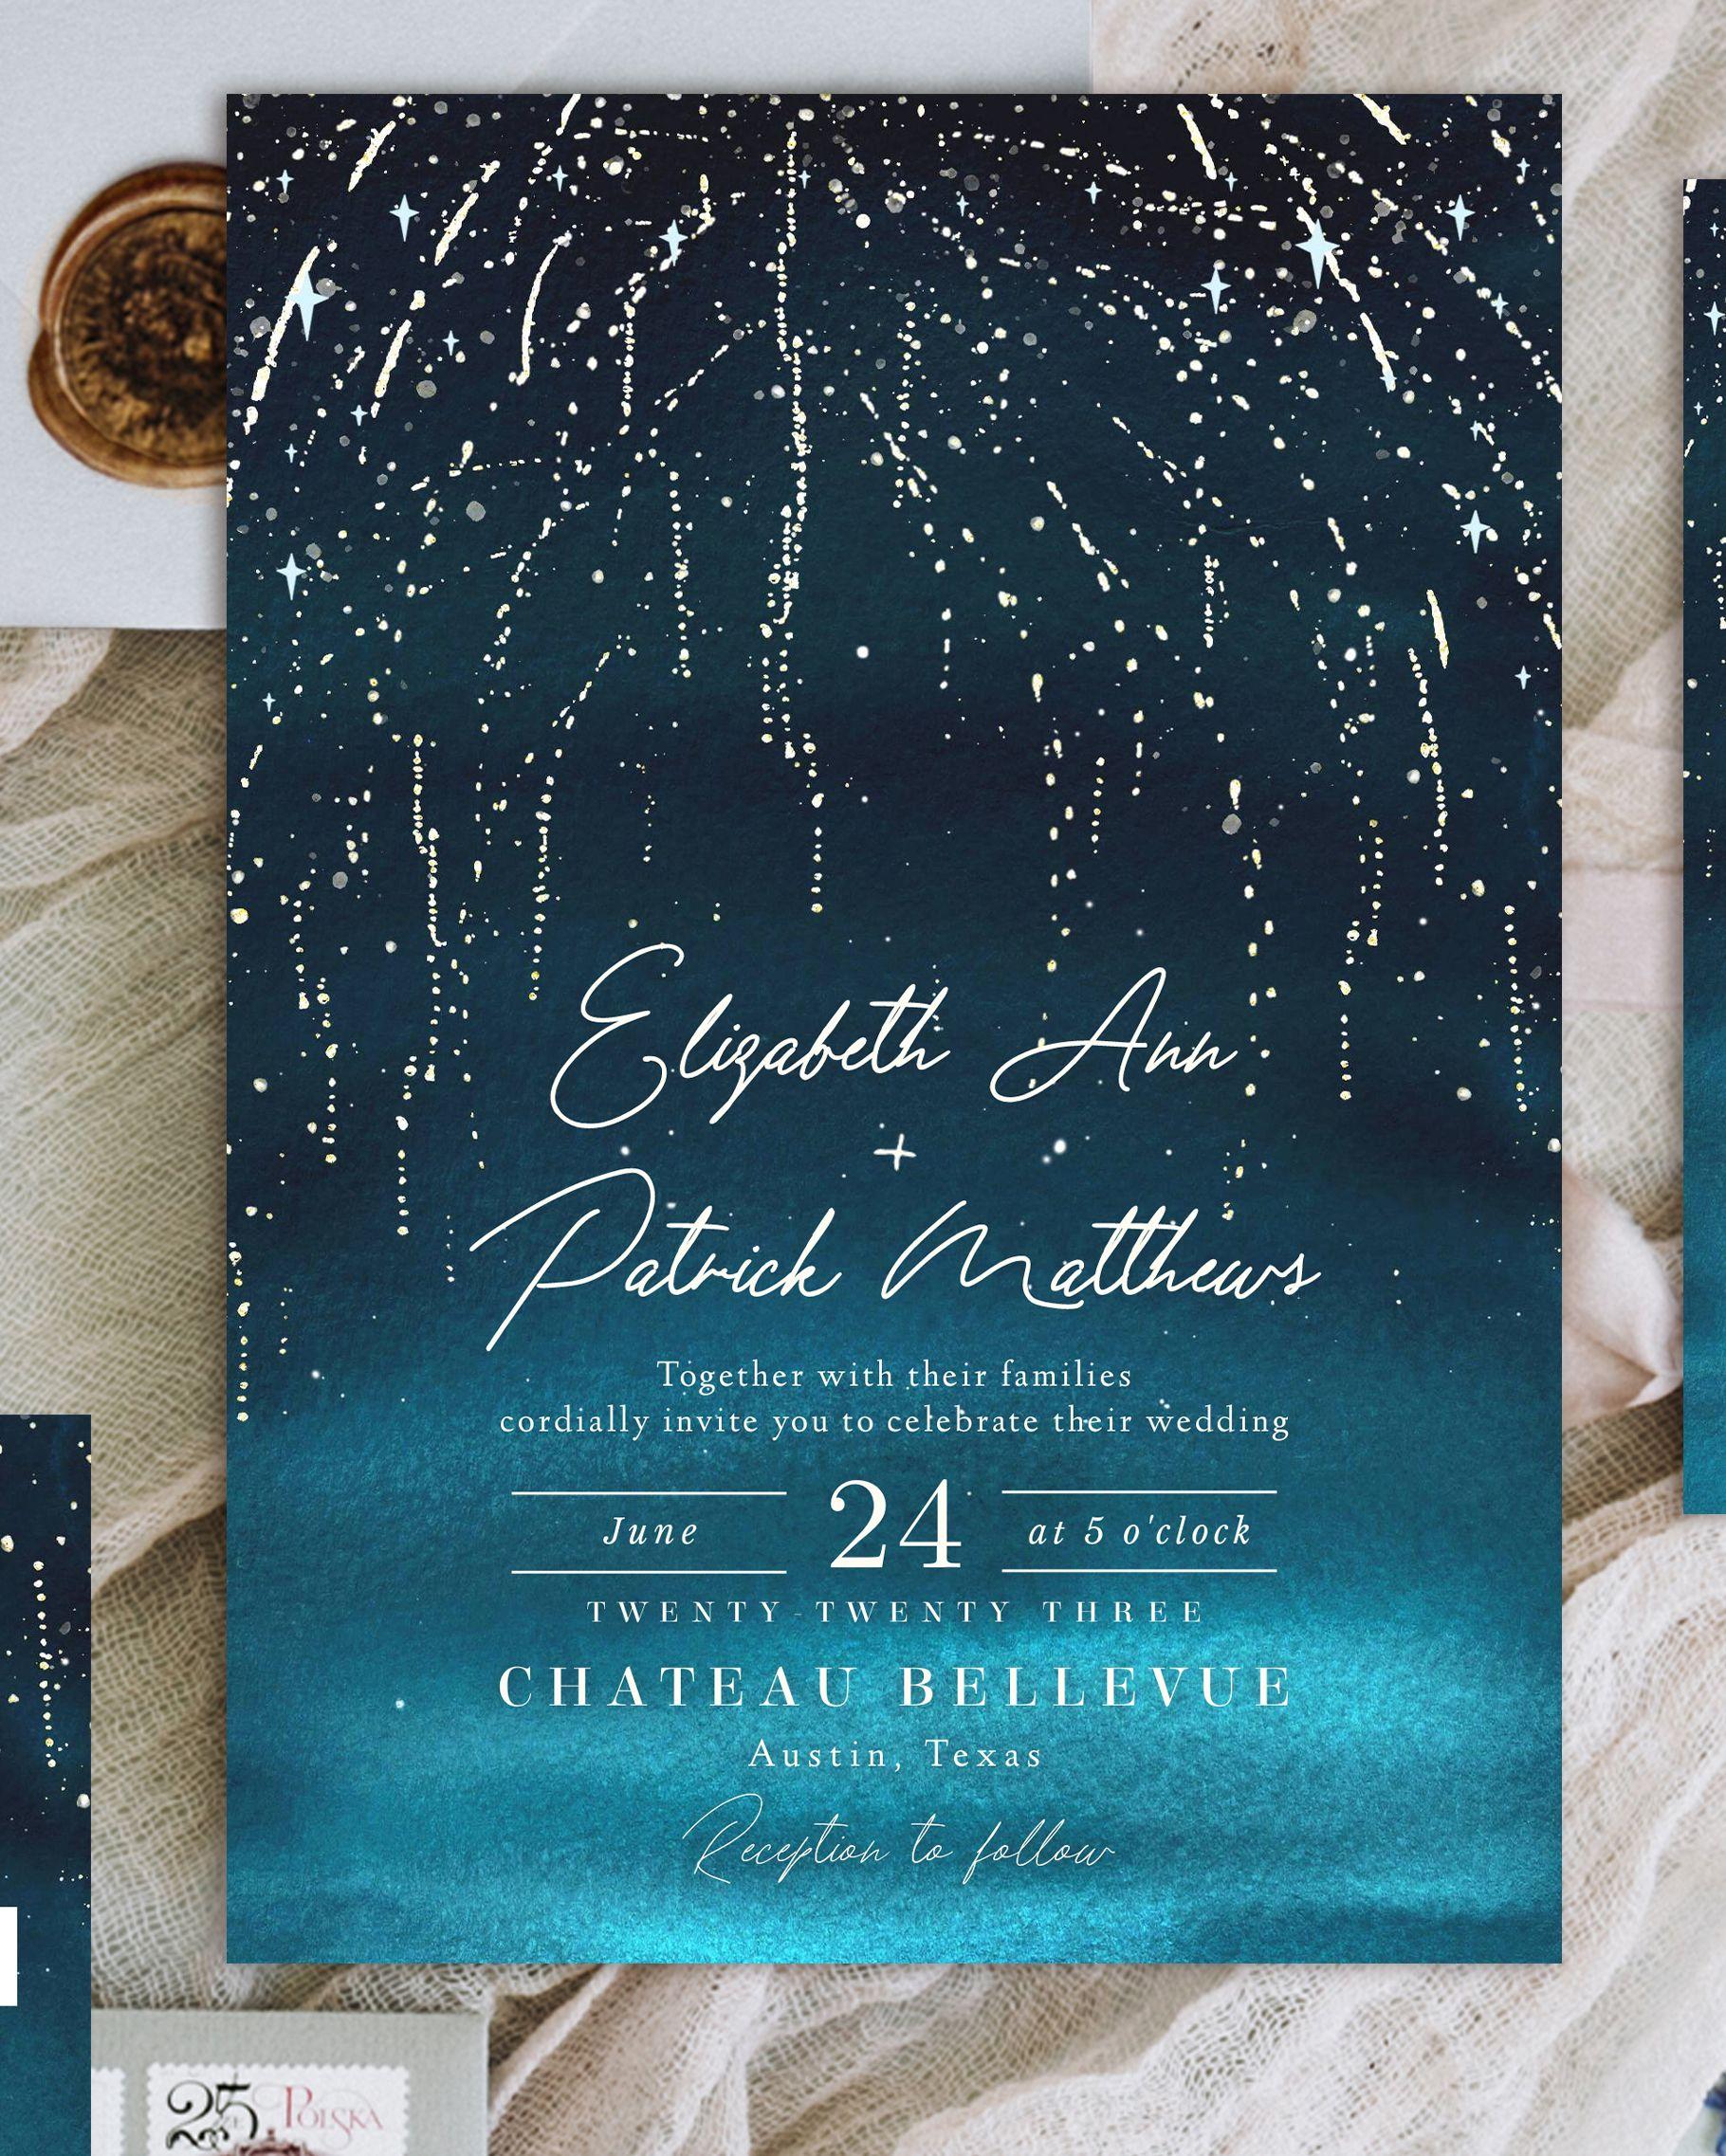 Golden Sparks Wedding Invitation Suite Fireworks Fairytale Etsy In 2020 Fireworks Wedding Invitations Stars Wedding Invitations Wedding Invitations